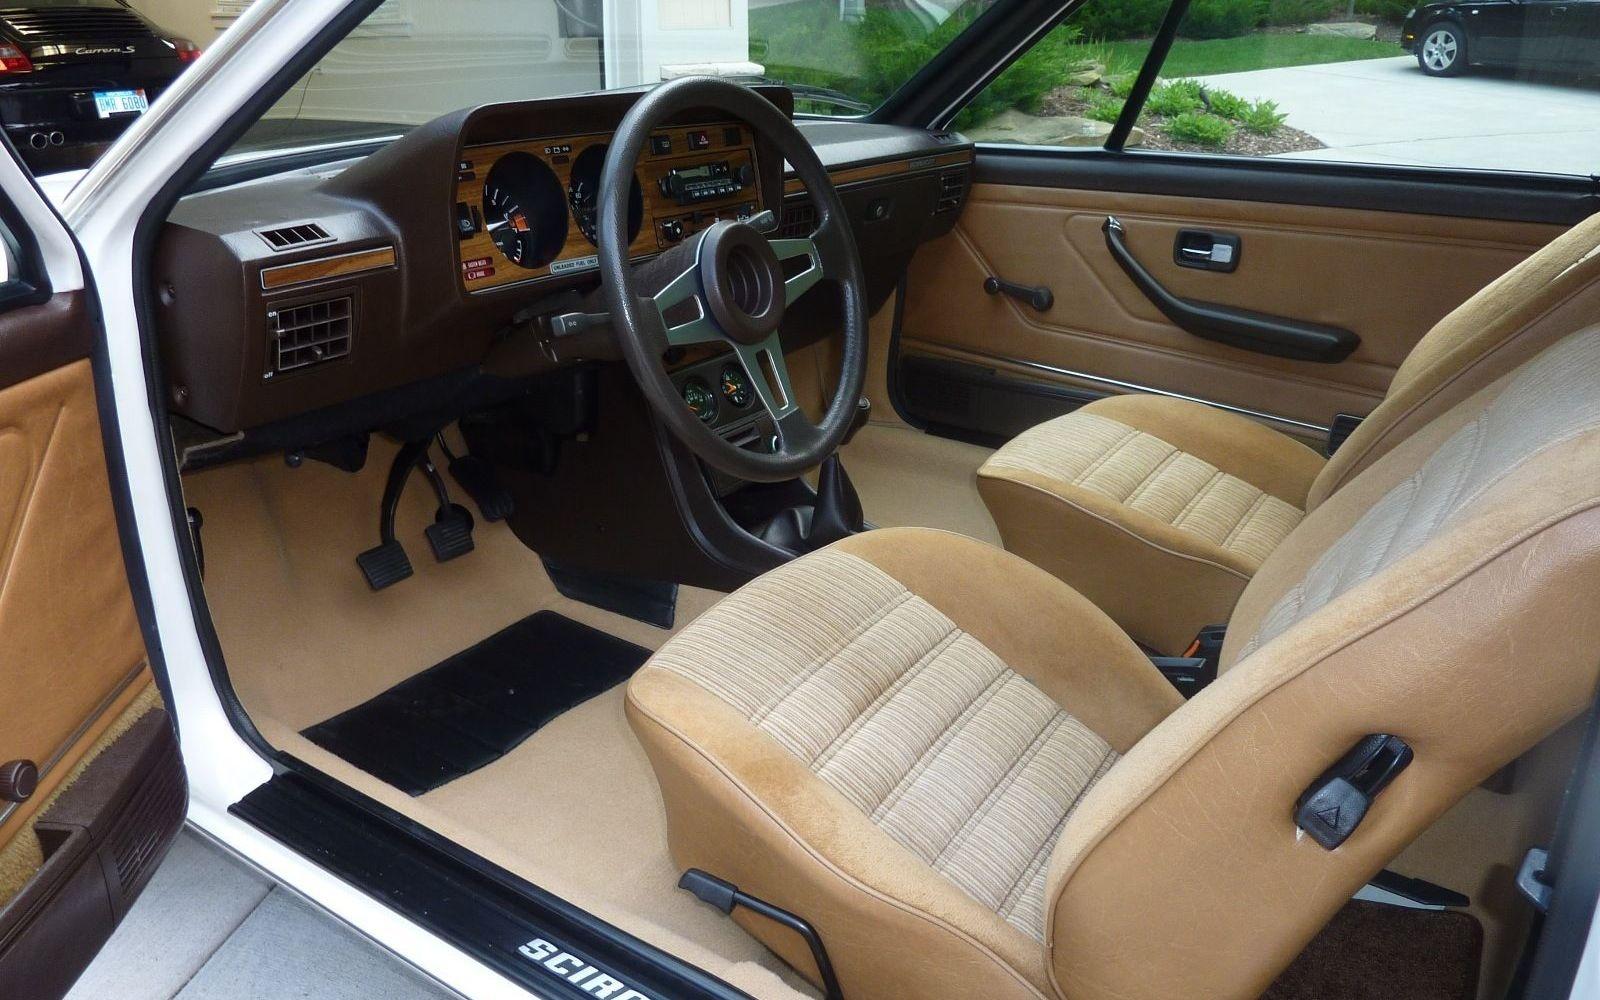 Car Cooling System >> Super Clean 1981 Volkswagen Scirocco